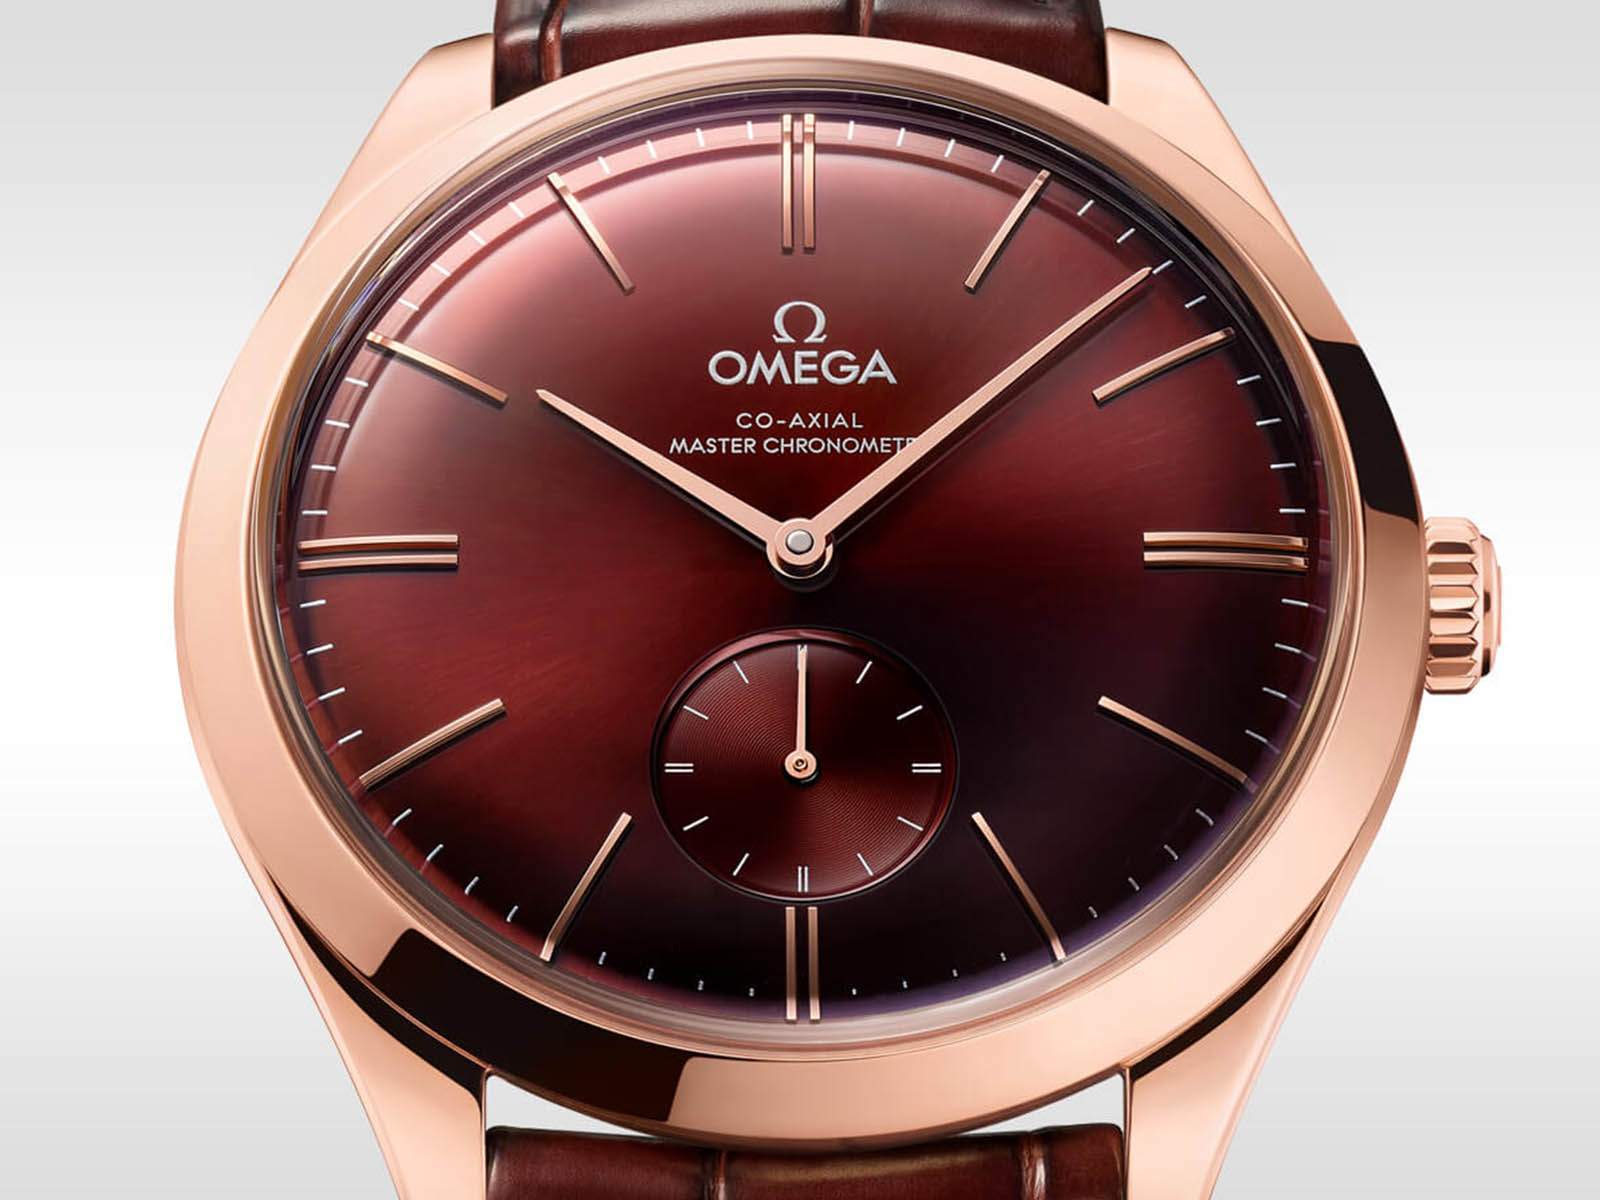 435-53-40-21-11-002-omega-de-ville-tresor-small-seconds-1.jpg